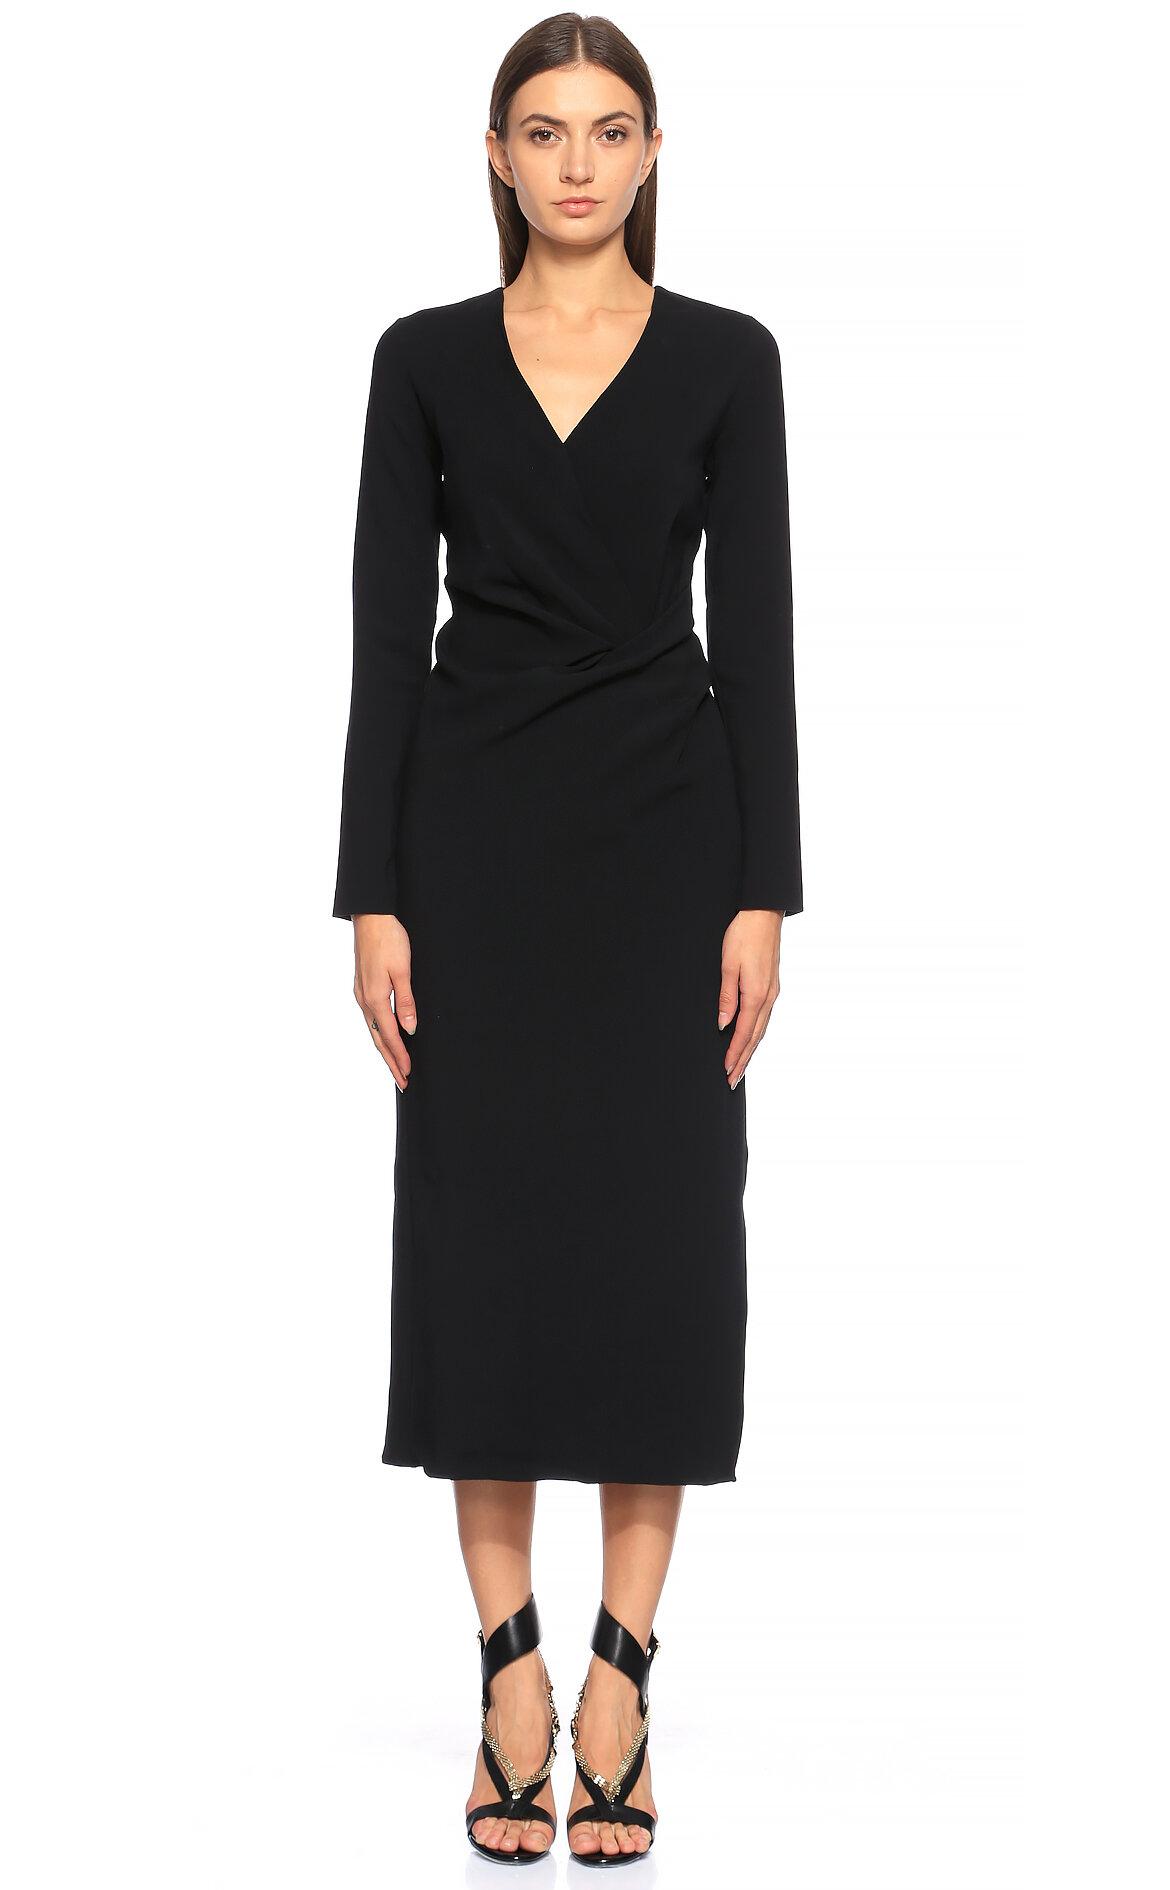 Lanvin-Lanvin V Yaka Midi Siyah Gece Elbisesi